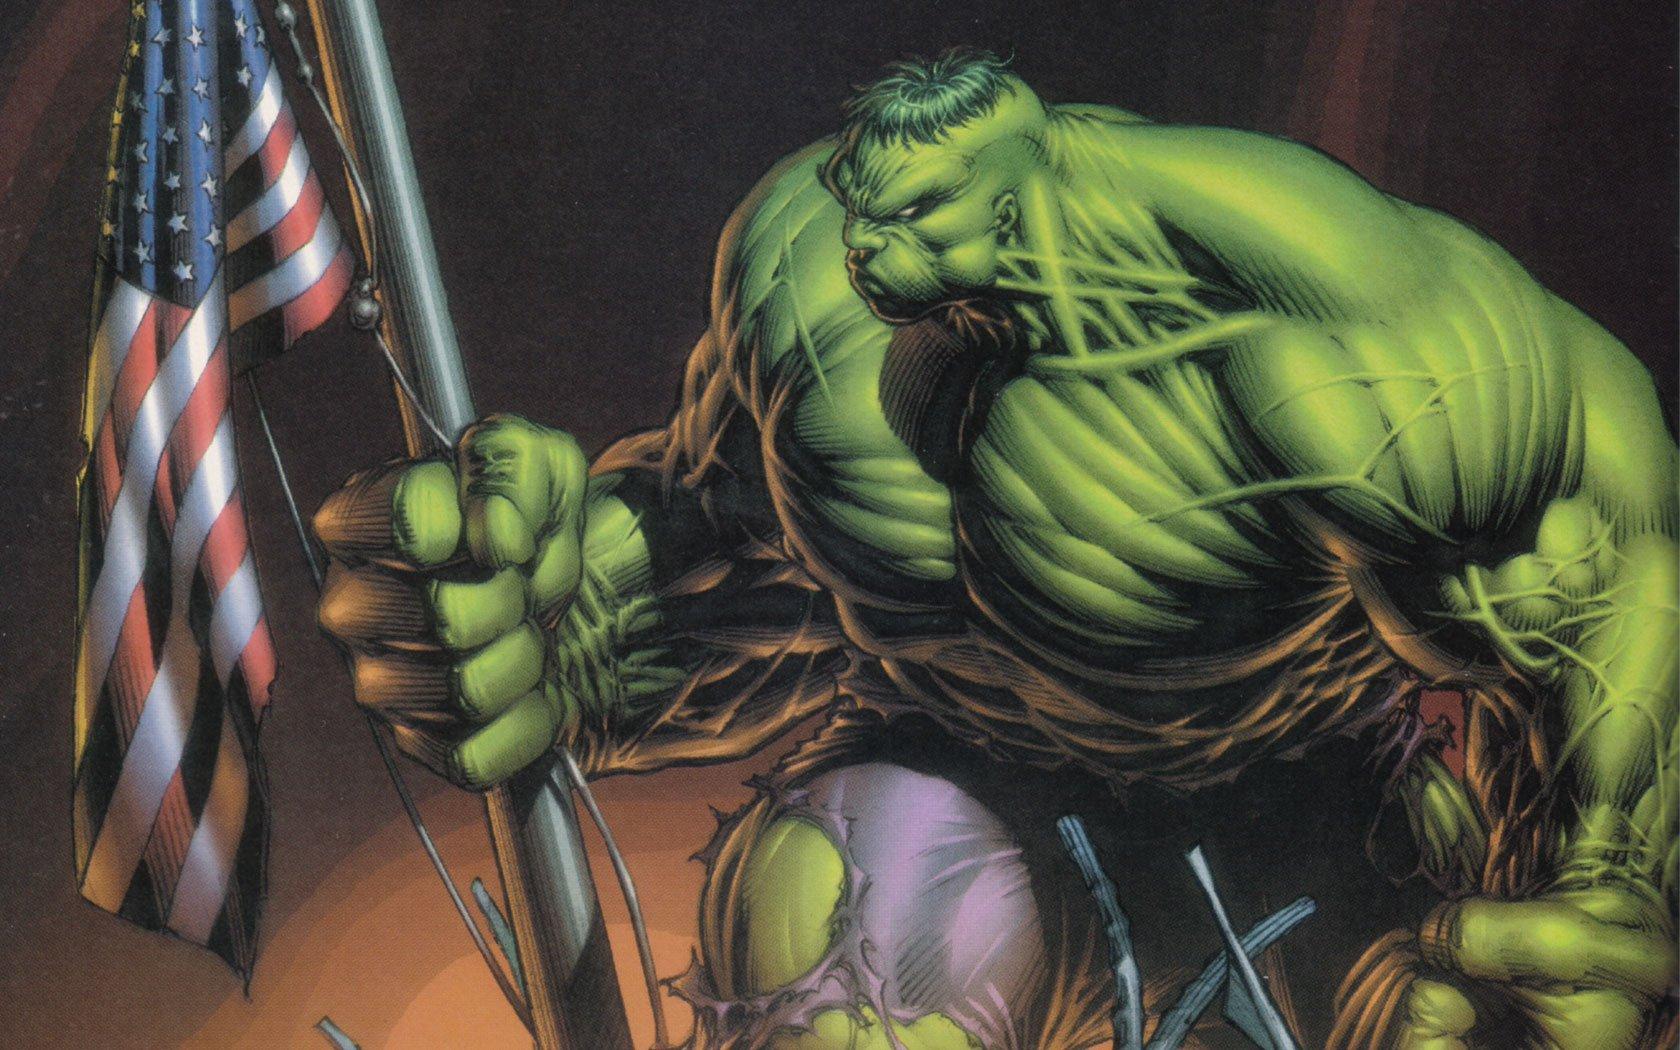 hulk comic character marvel comics wallpaper 1680x1050